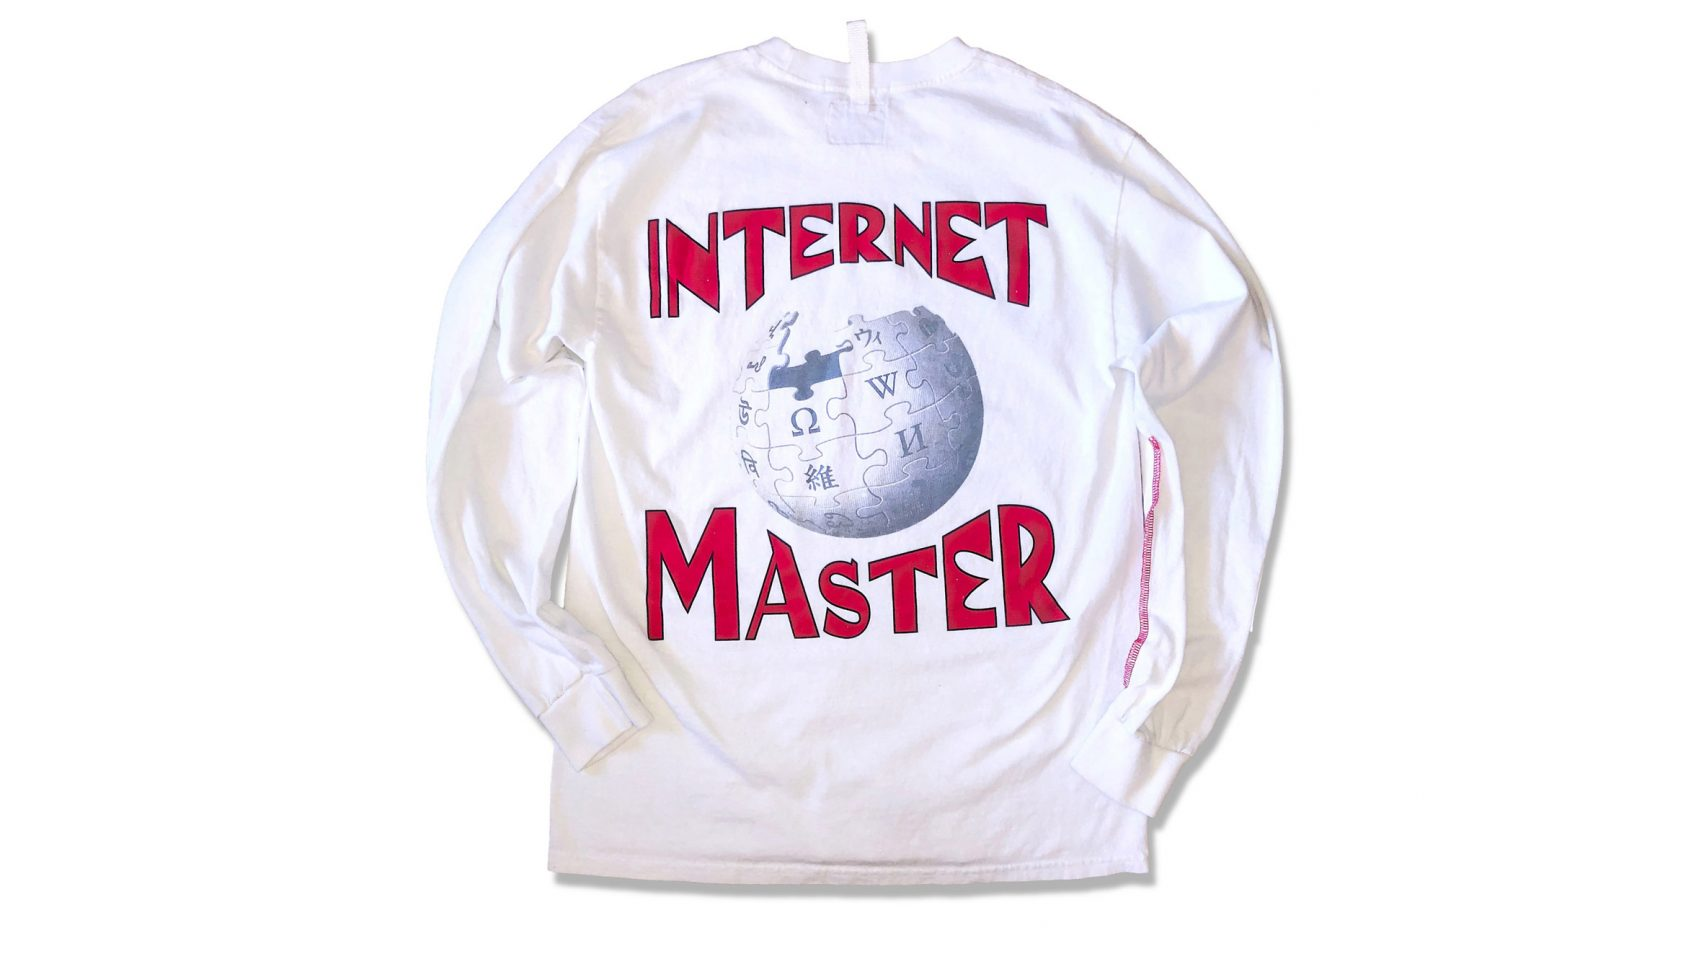 19b0273661c2 Wikipedia launcht überraschend Streetwear